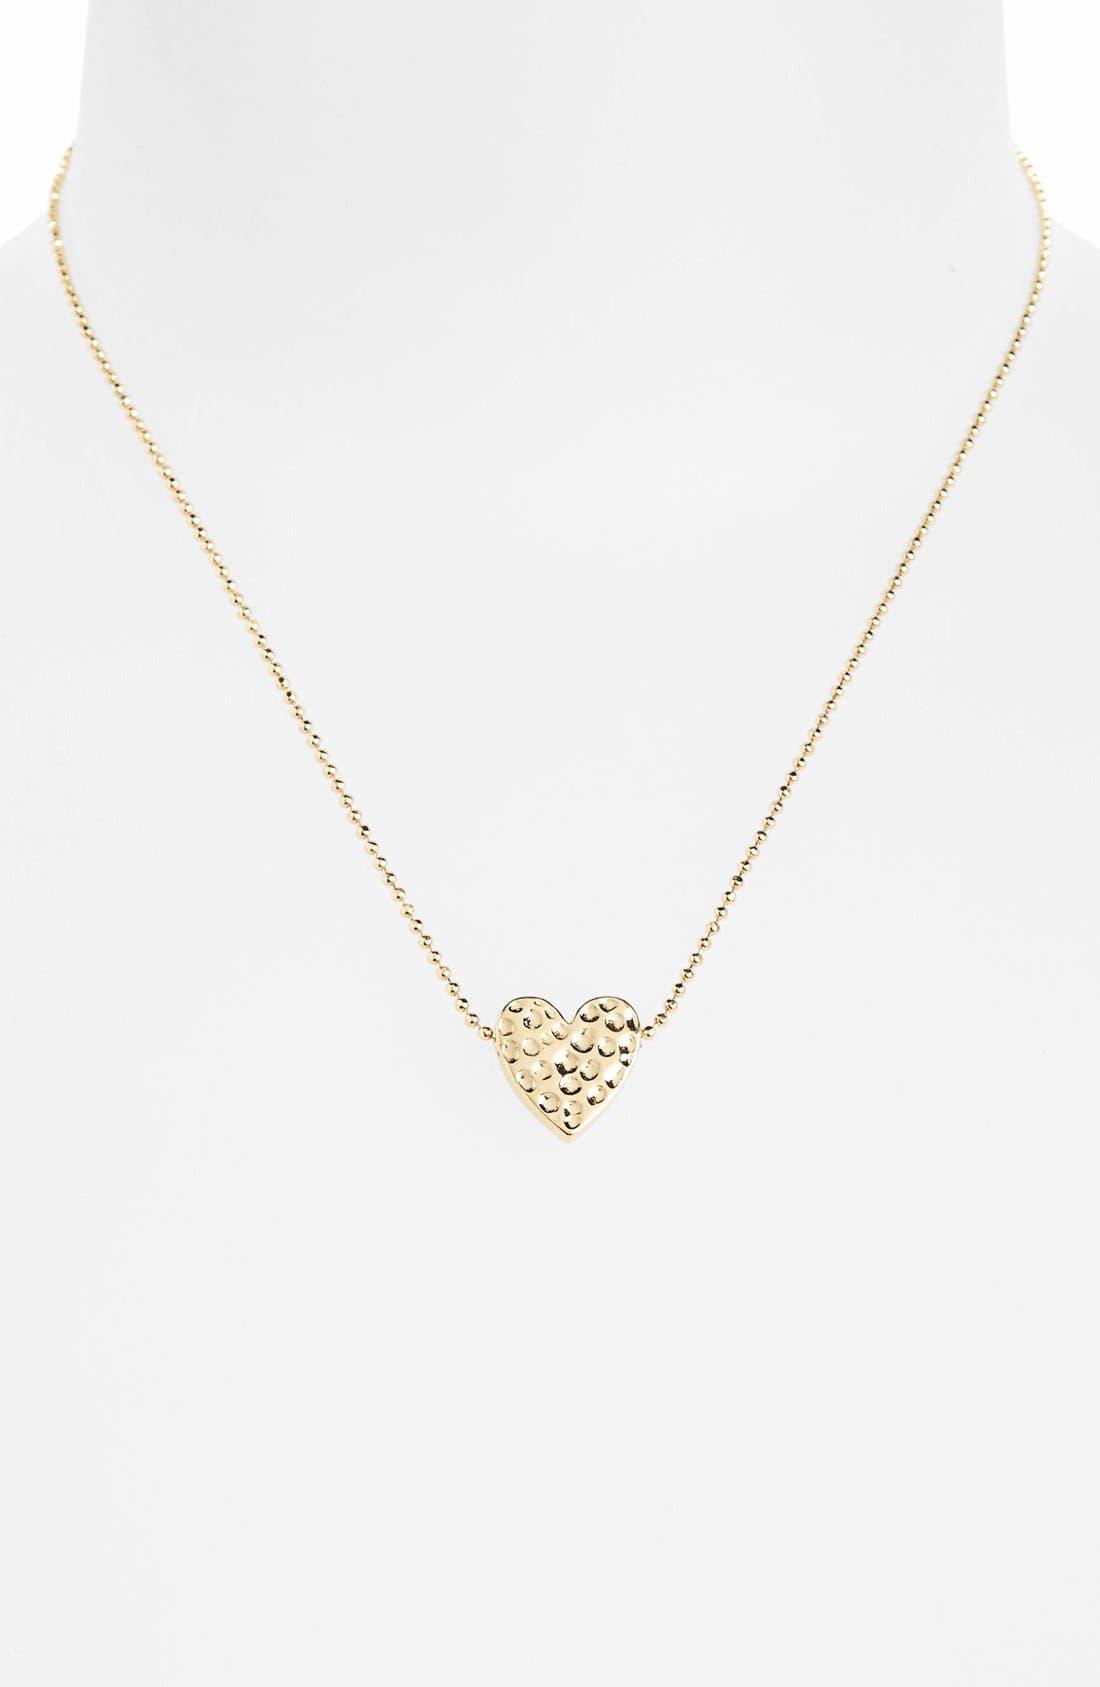 Alternate Image 1 Selected - Topshop 'Beaten Heart' Necklace